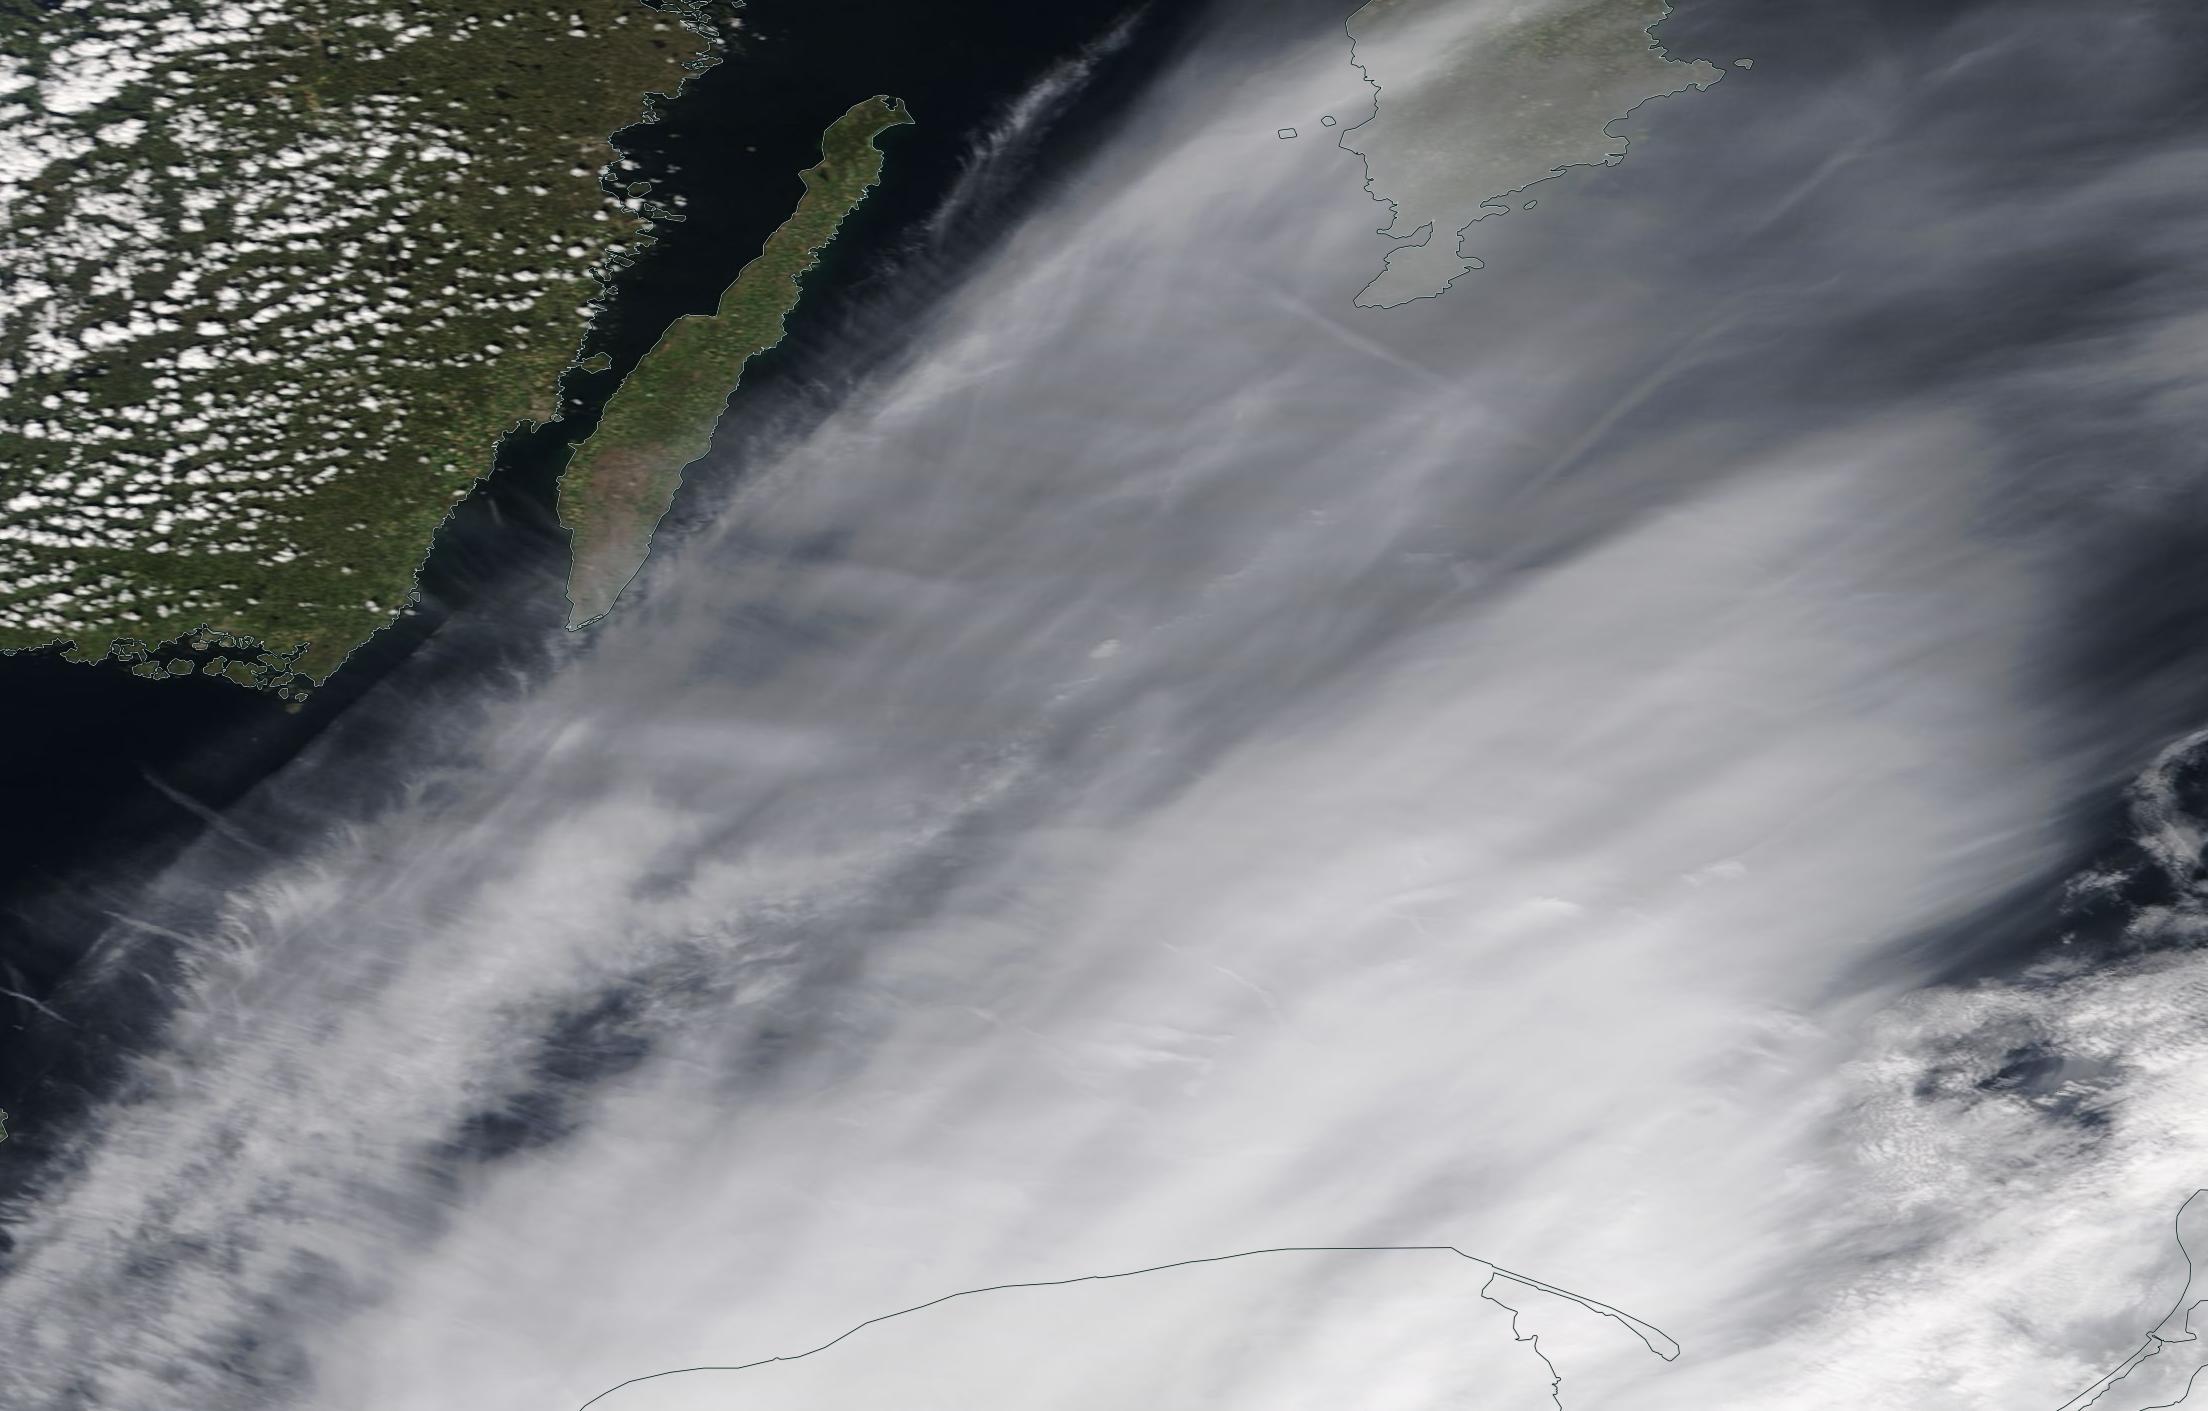 Baltic Sea, Oland, Gdansk chemtrails geoengineering Sunday 12 May 2019 ... https://go.nasa.gov/2E4JQ37